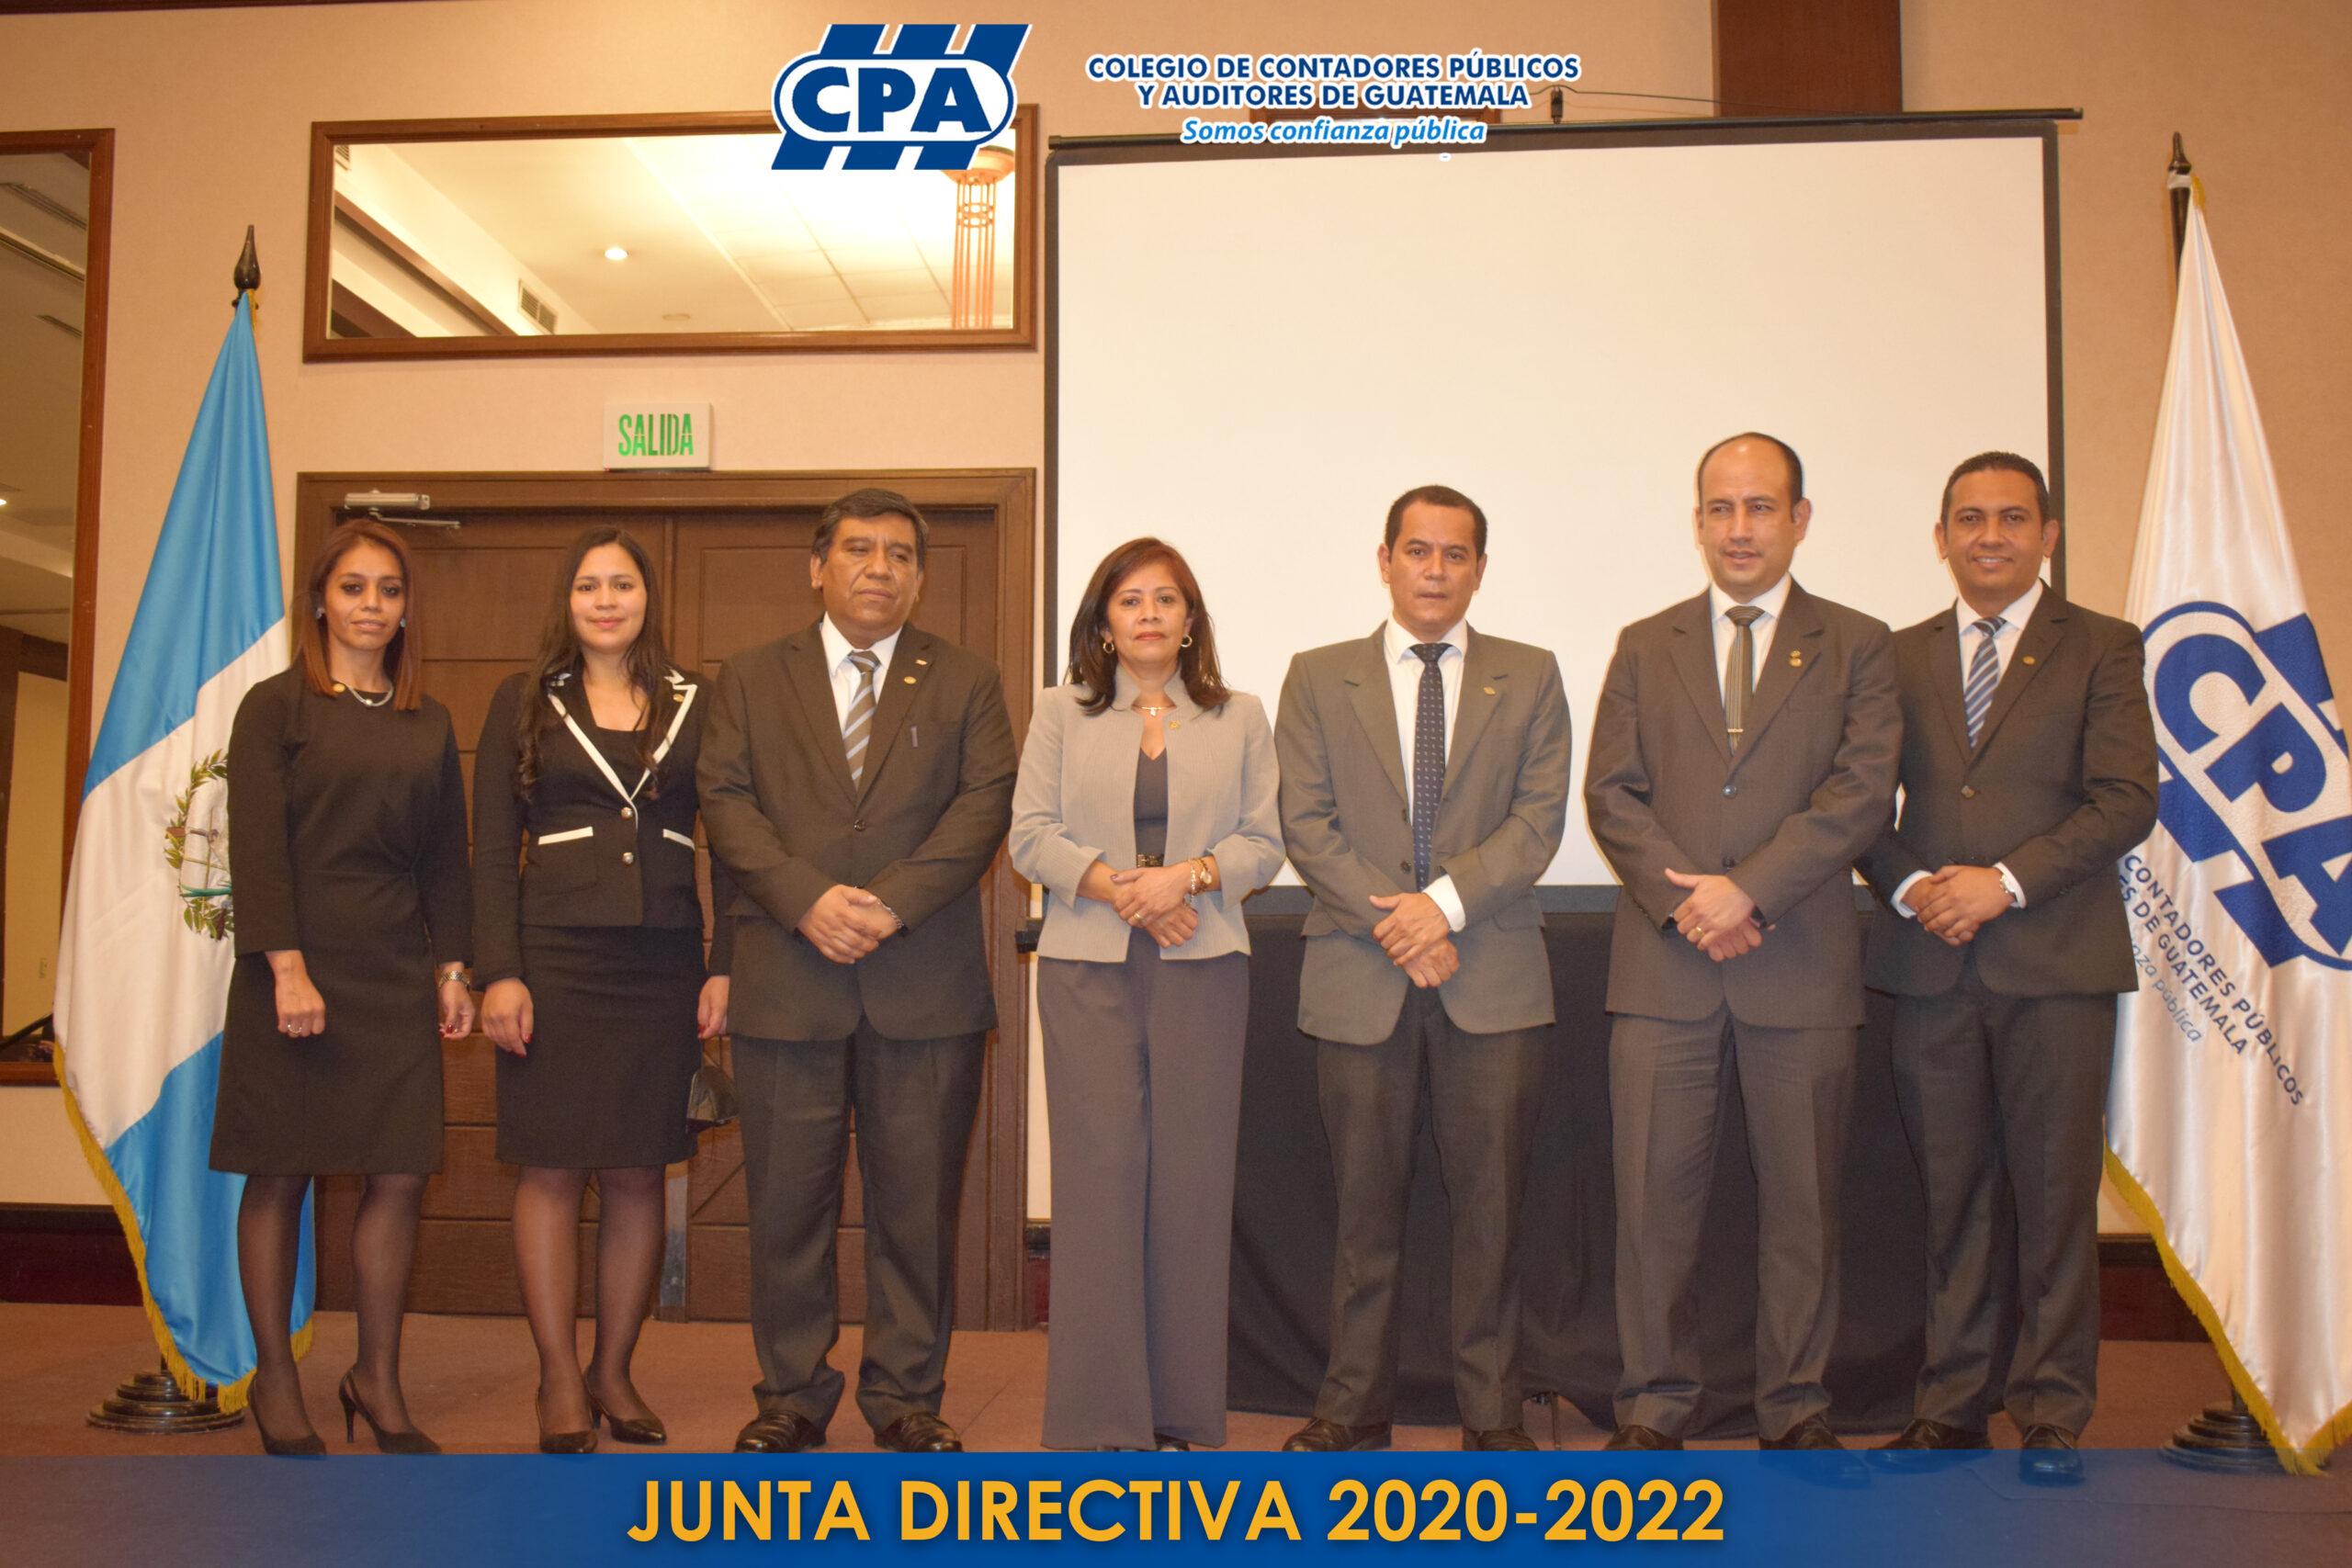 JUNTA DIRECTIVA 2020-2022